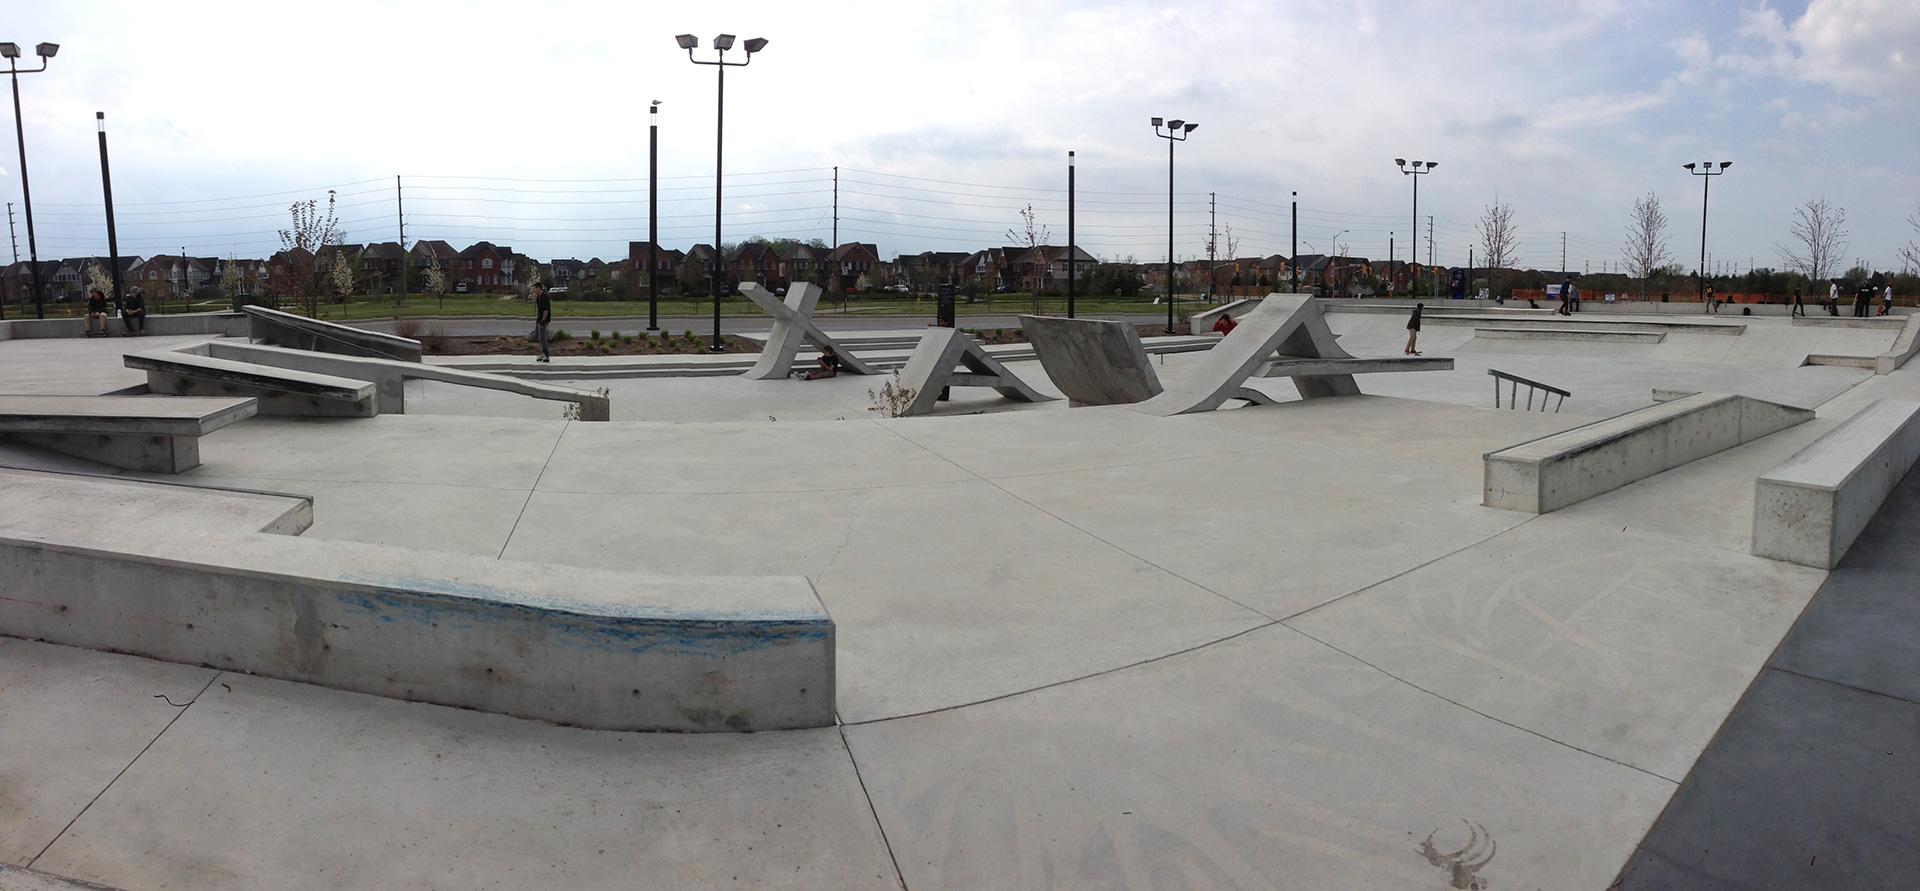 ajax skatepark from the side